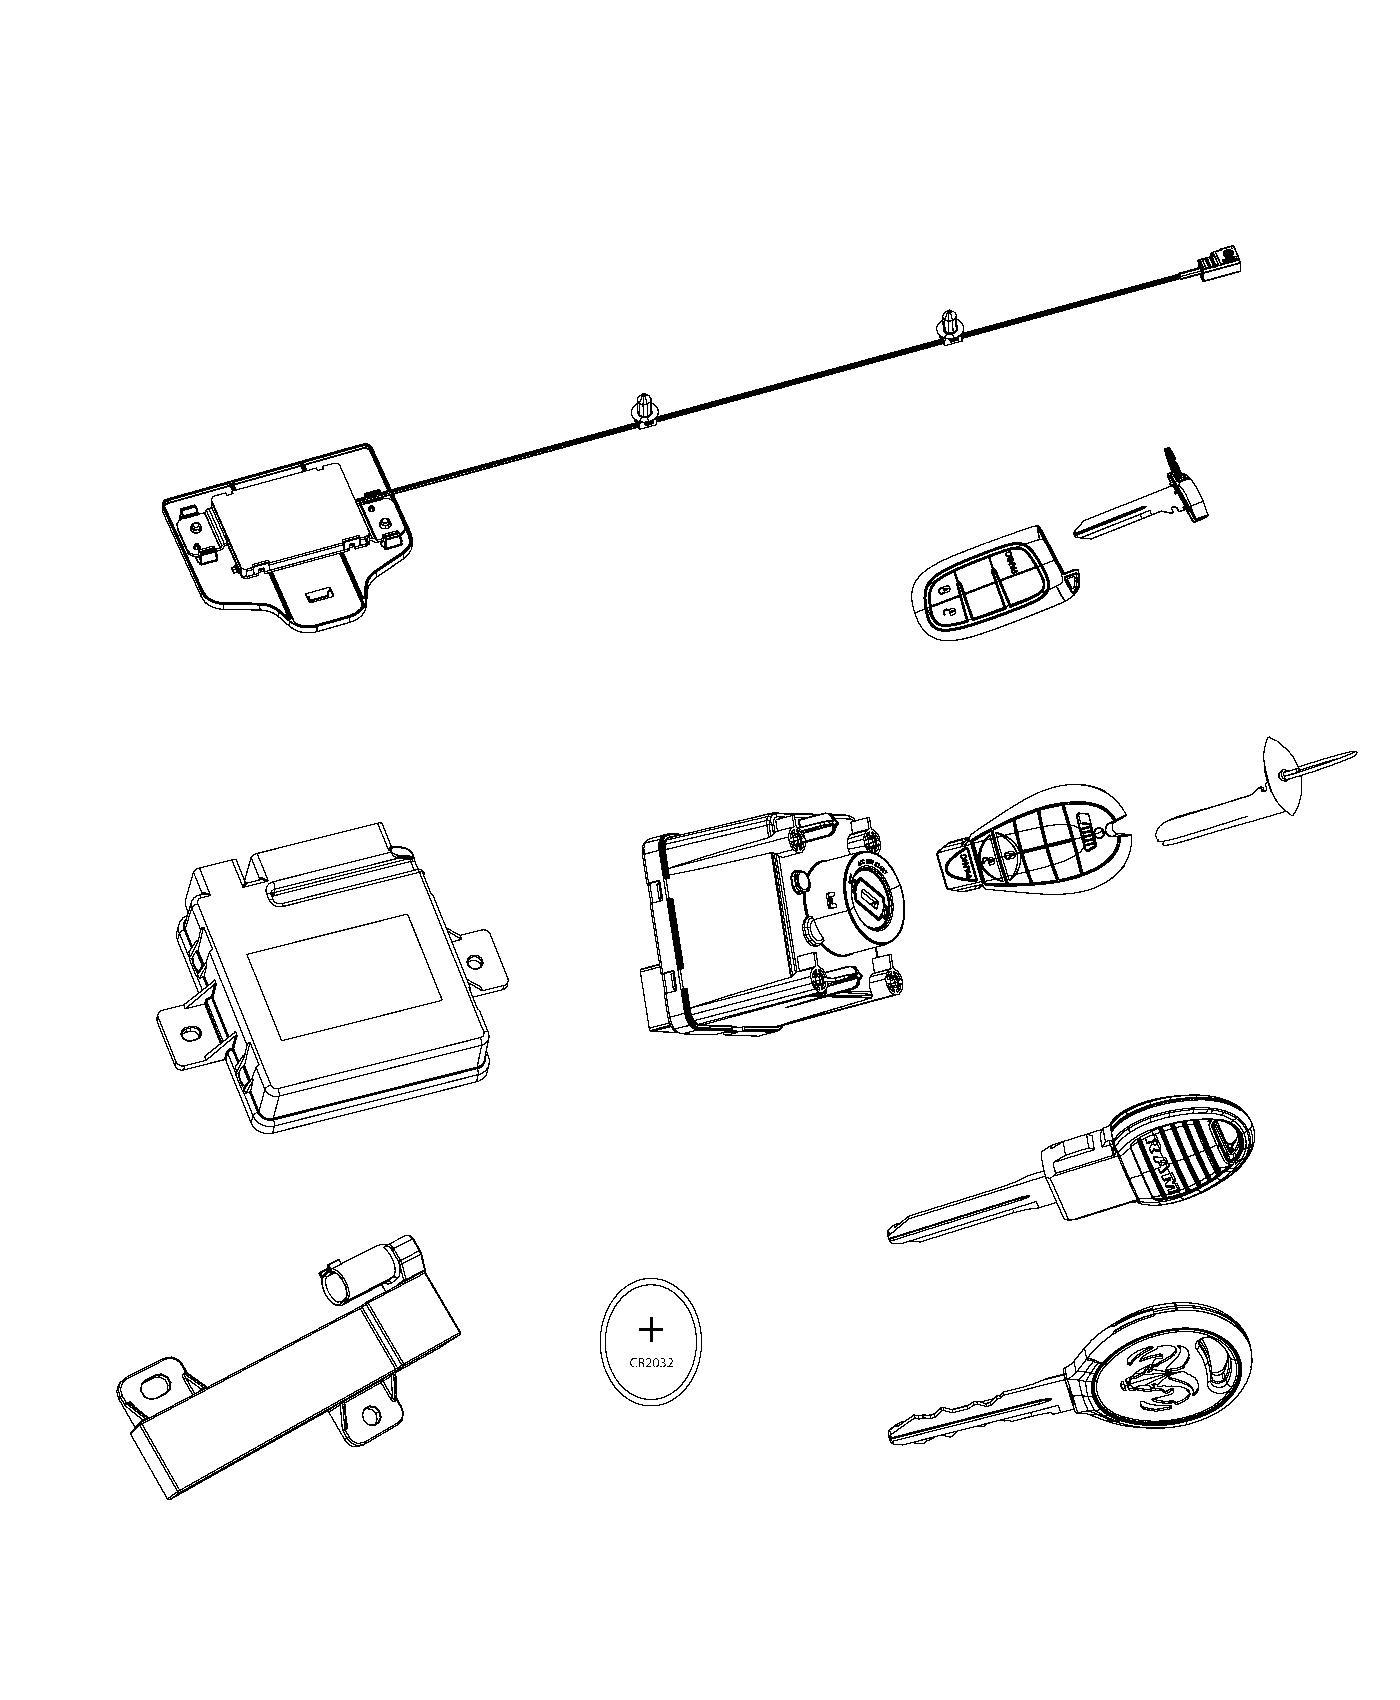 2013 Dodge Ram 1500 Receiver. Hub. [sentry key theft